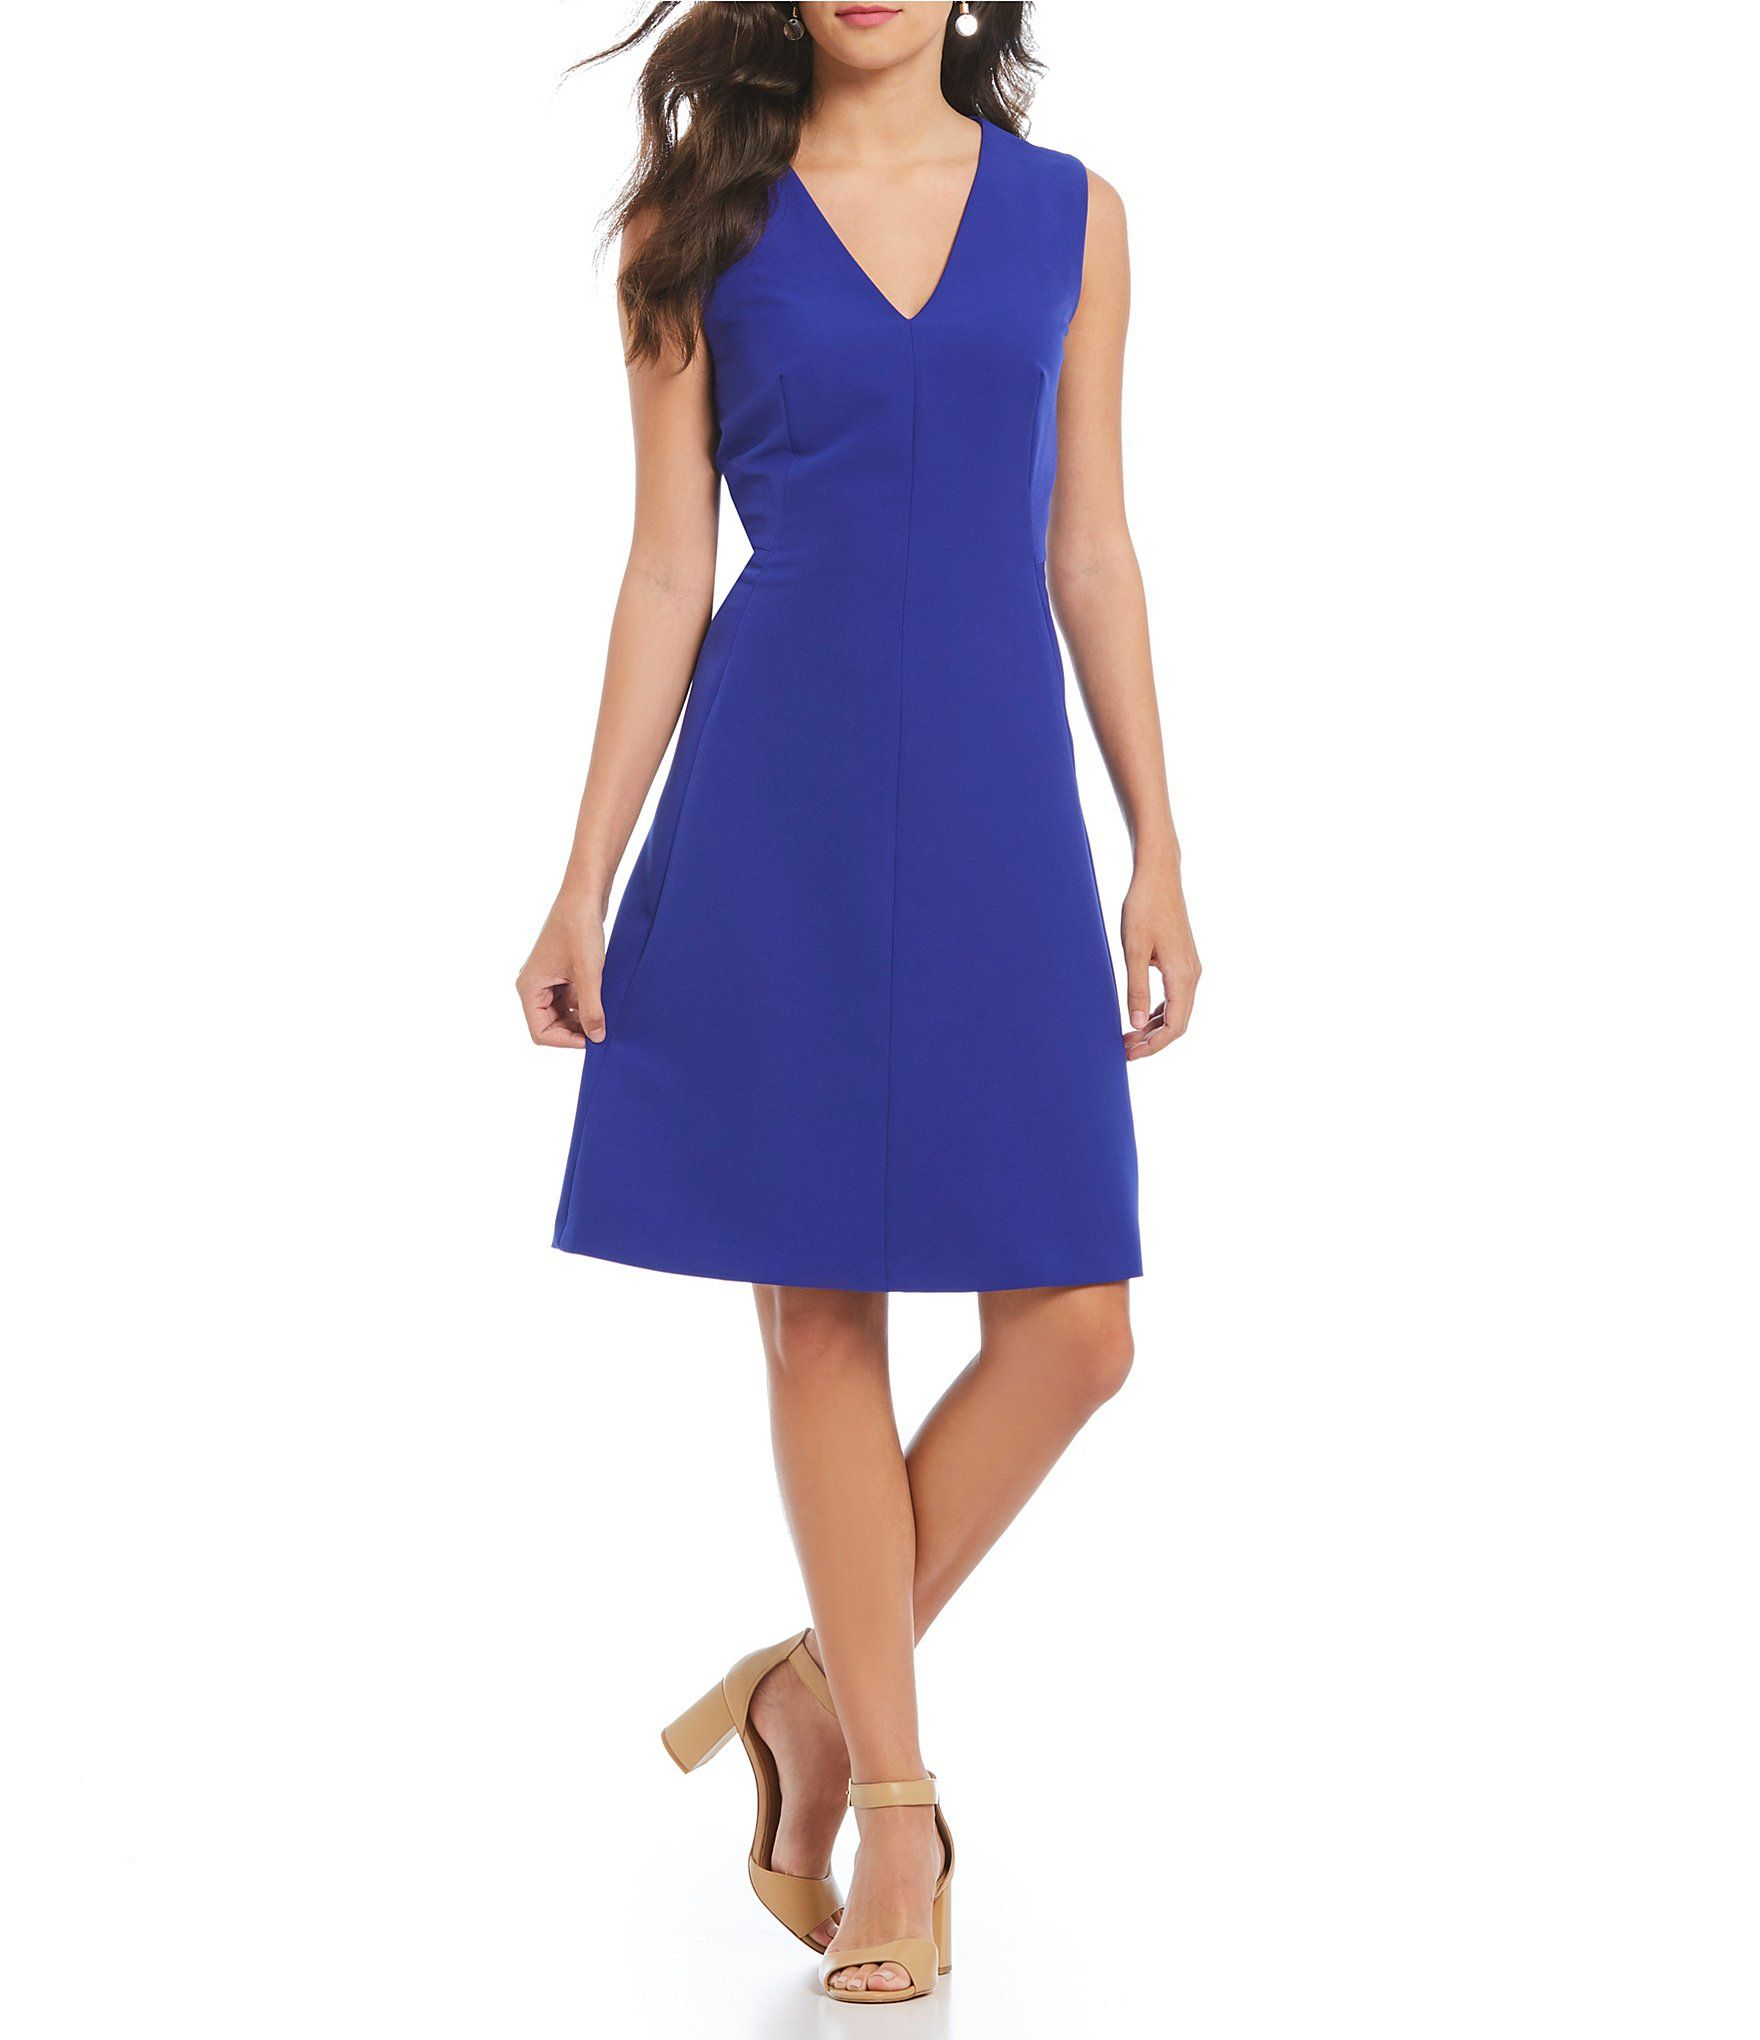 57bbe149d97 Shop for Antonio Melani Sleeveless Sophia Dress at Dillards.com. Visit  Dillards.com to find clothing